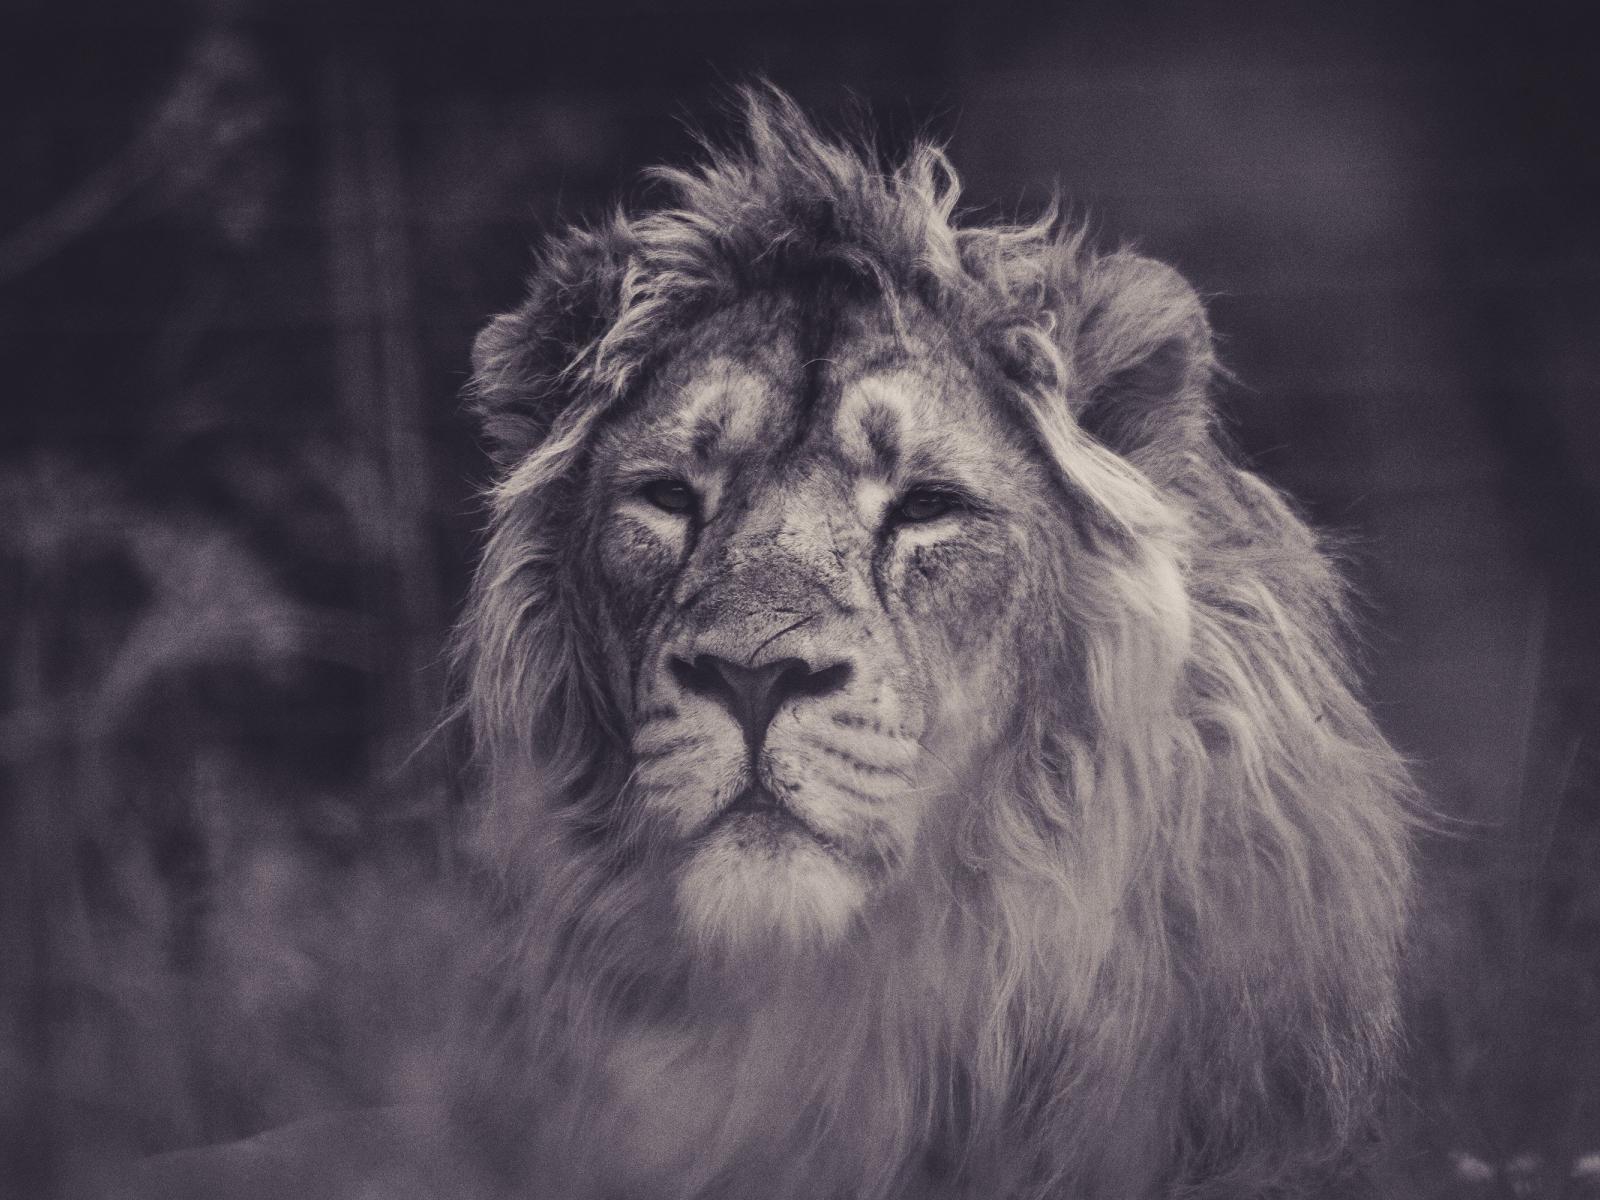 Lion, calm, predator, muzzle, 1600x1200 wallpaper